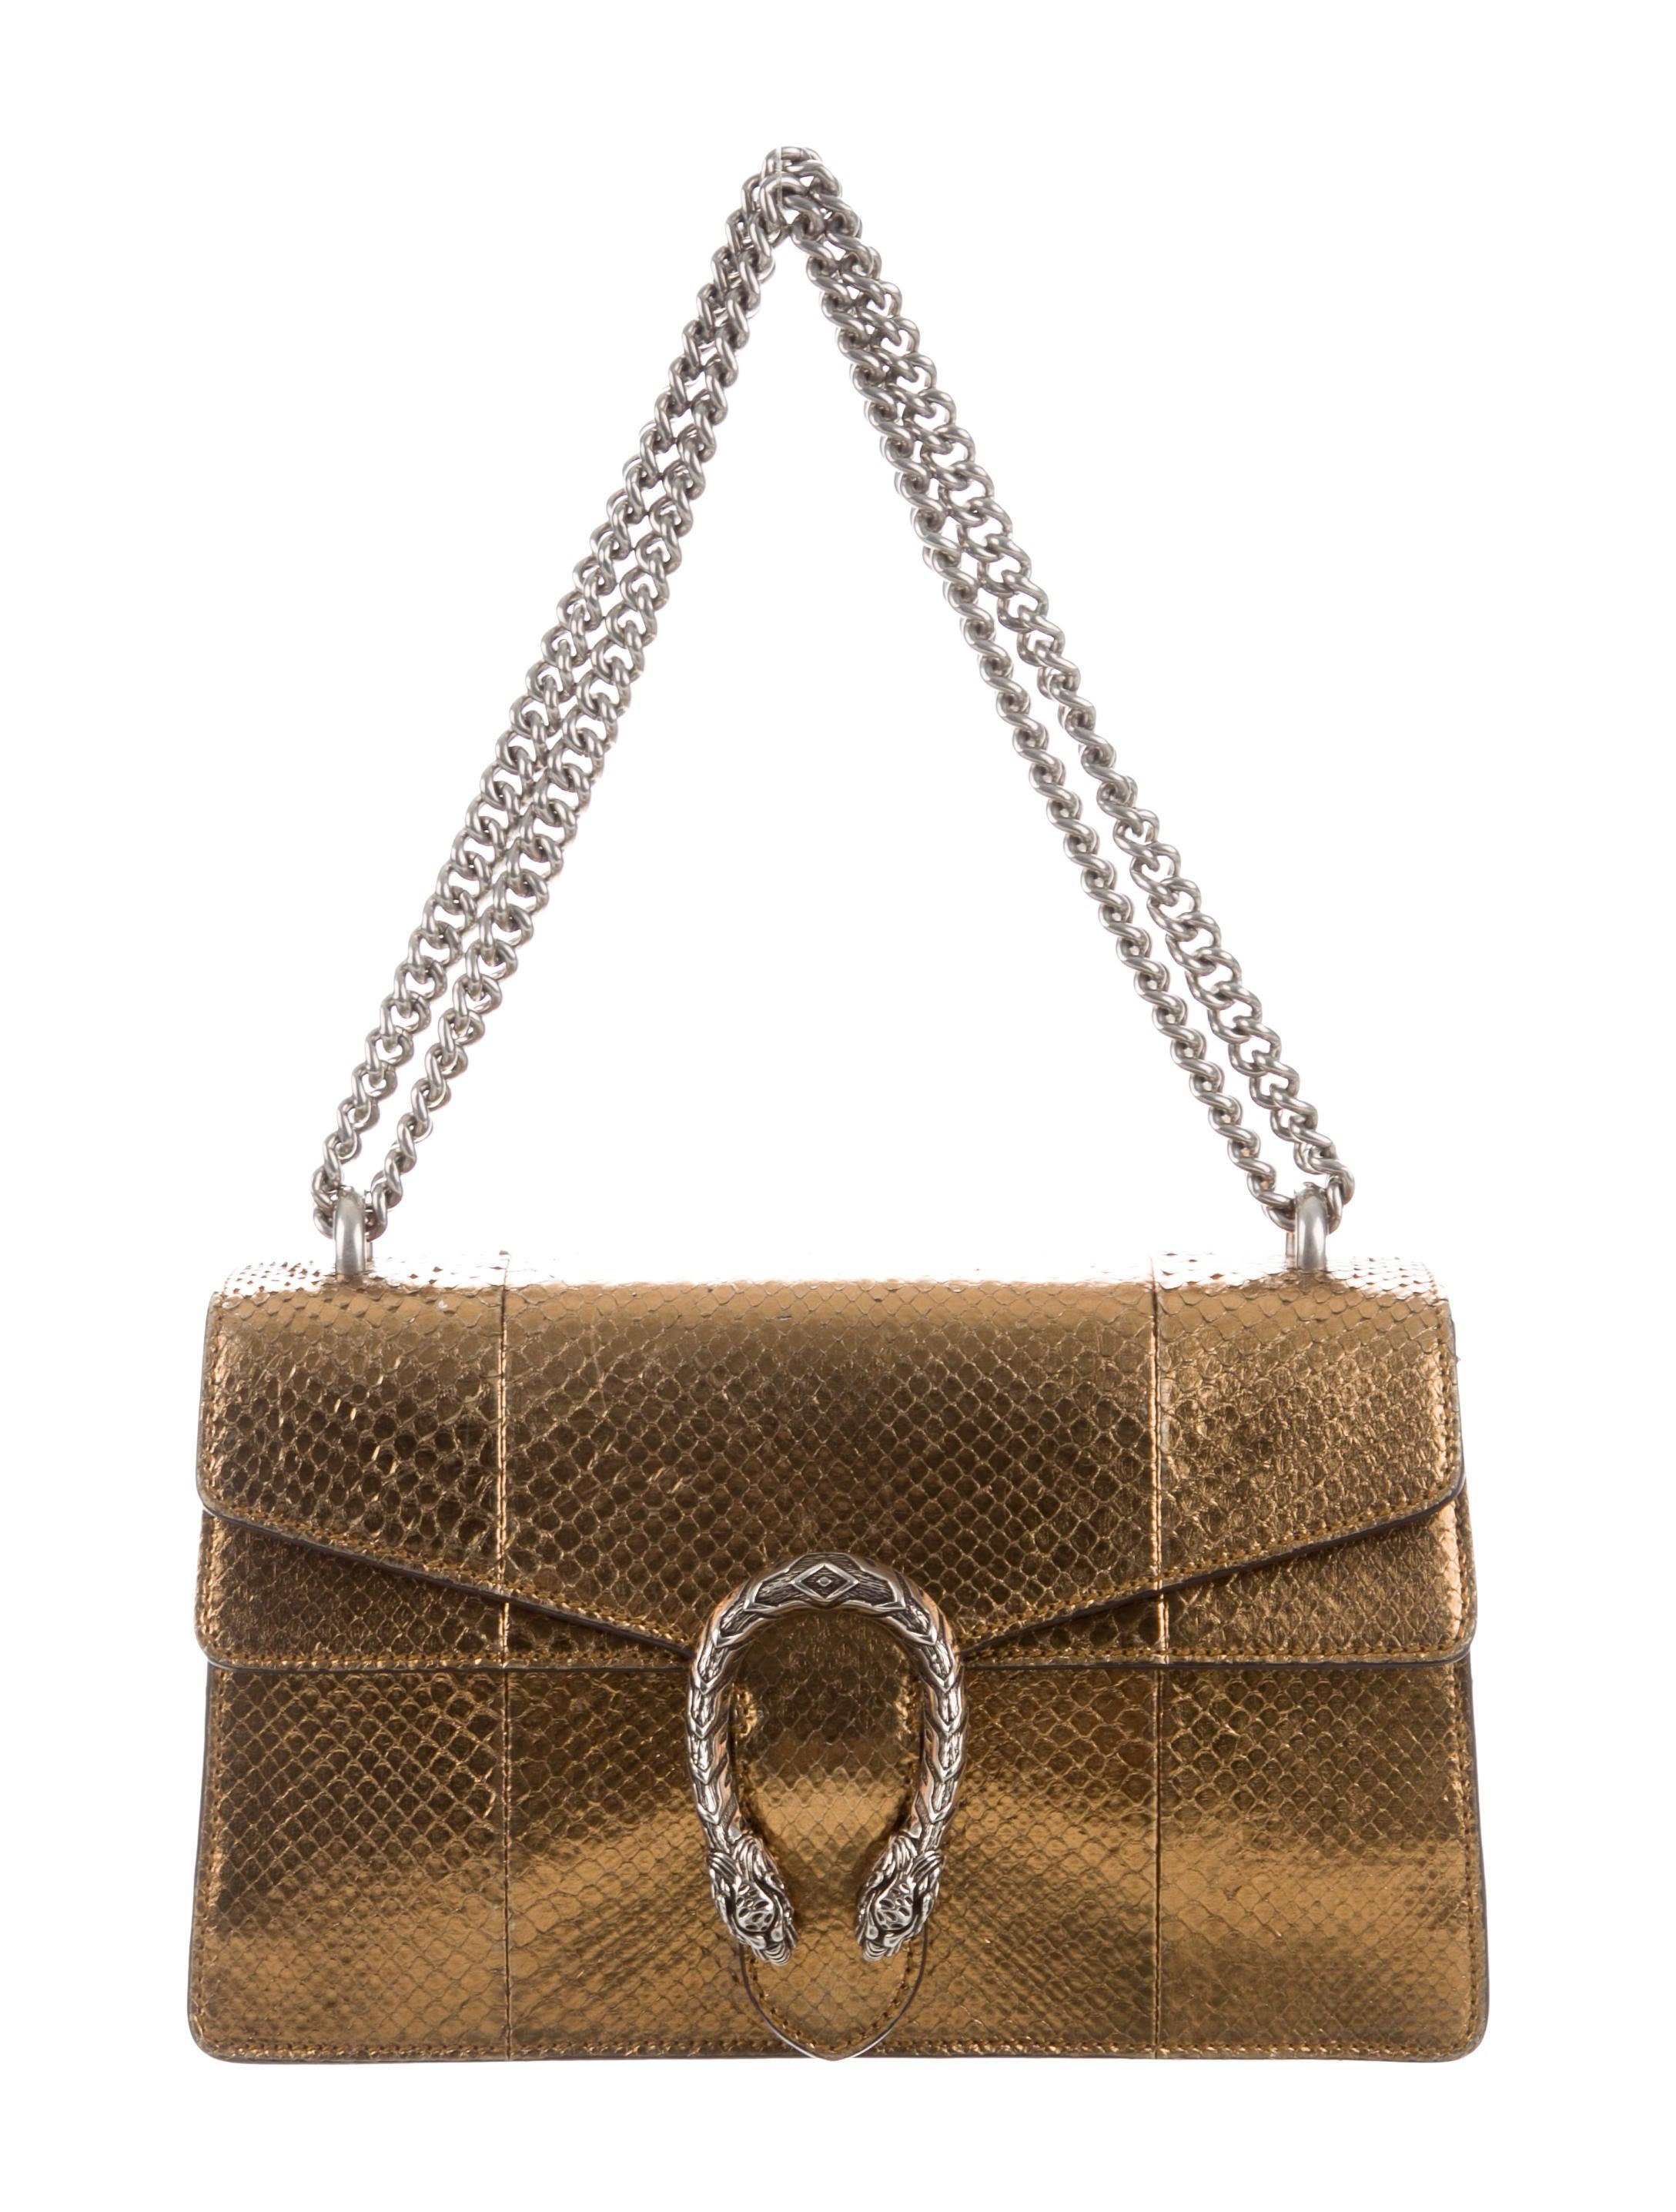 687324b181e ... Crossbody Wallet Bag. Consign. Consign. Gucci Metallic Python Dionysus  Bag Handbags Guc287458 The Realreal